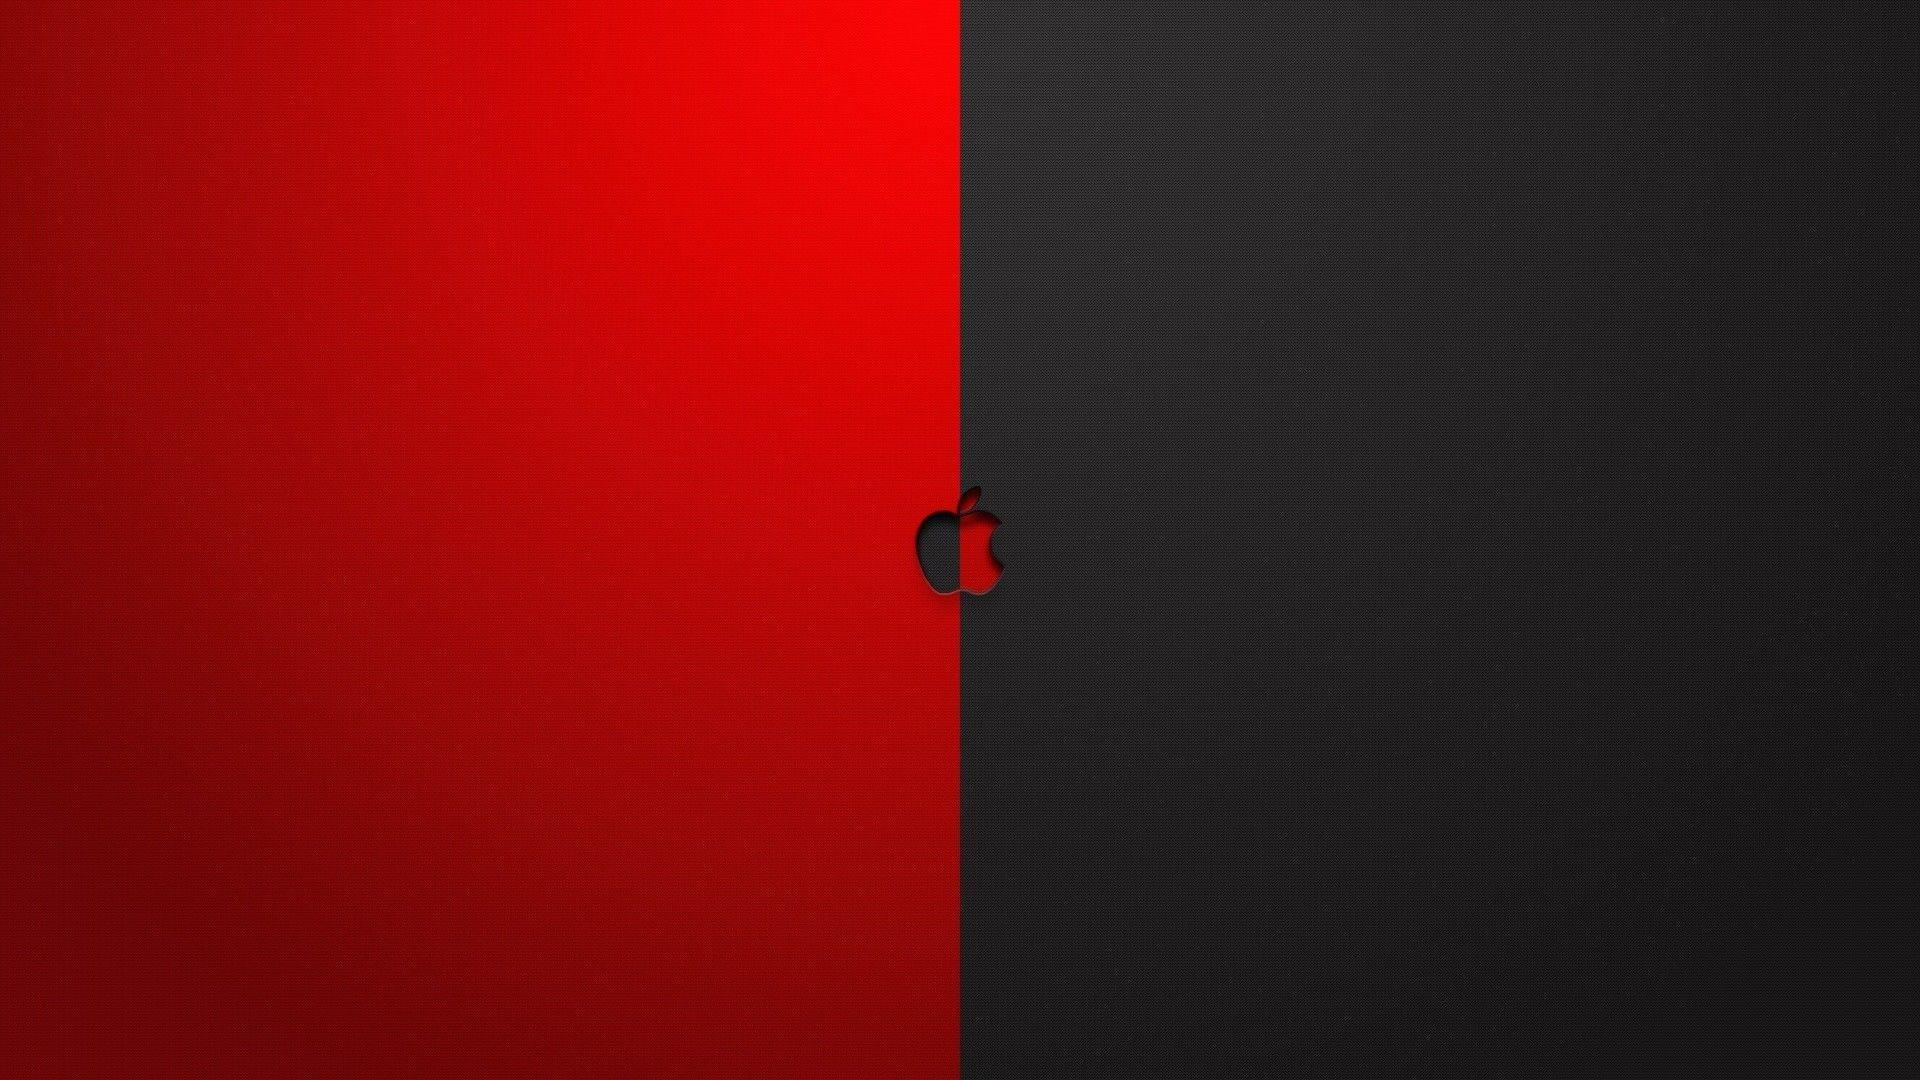 Unduh 200 Wallpaper Black Windows 10 HD Terbaru